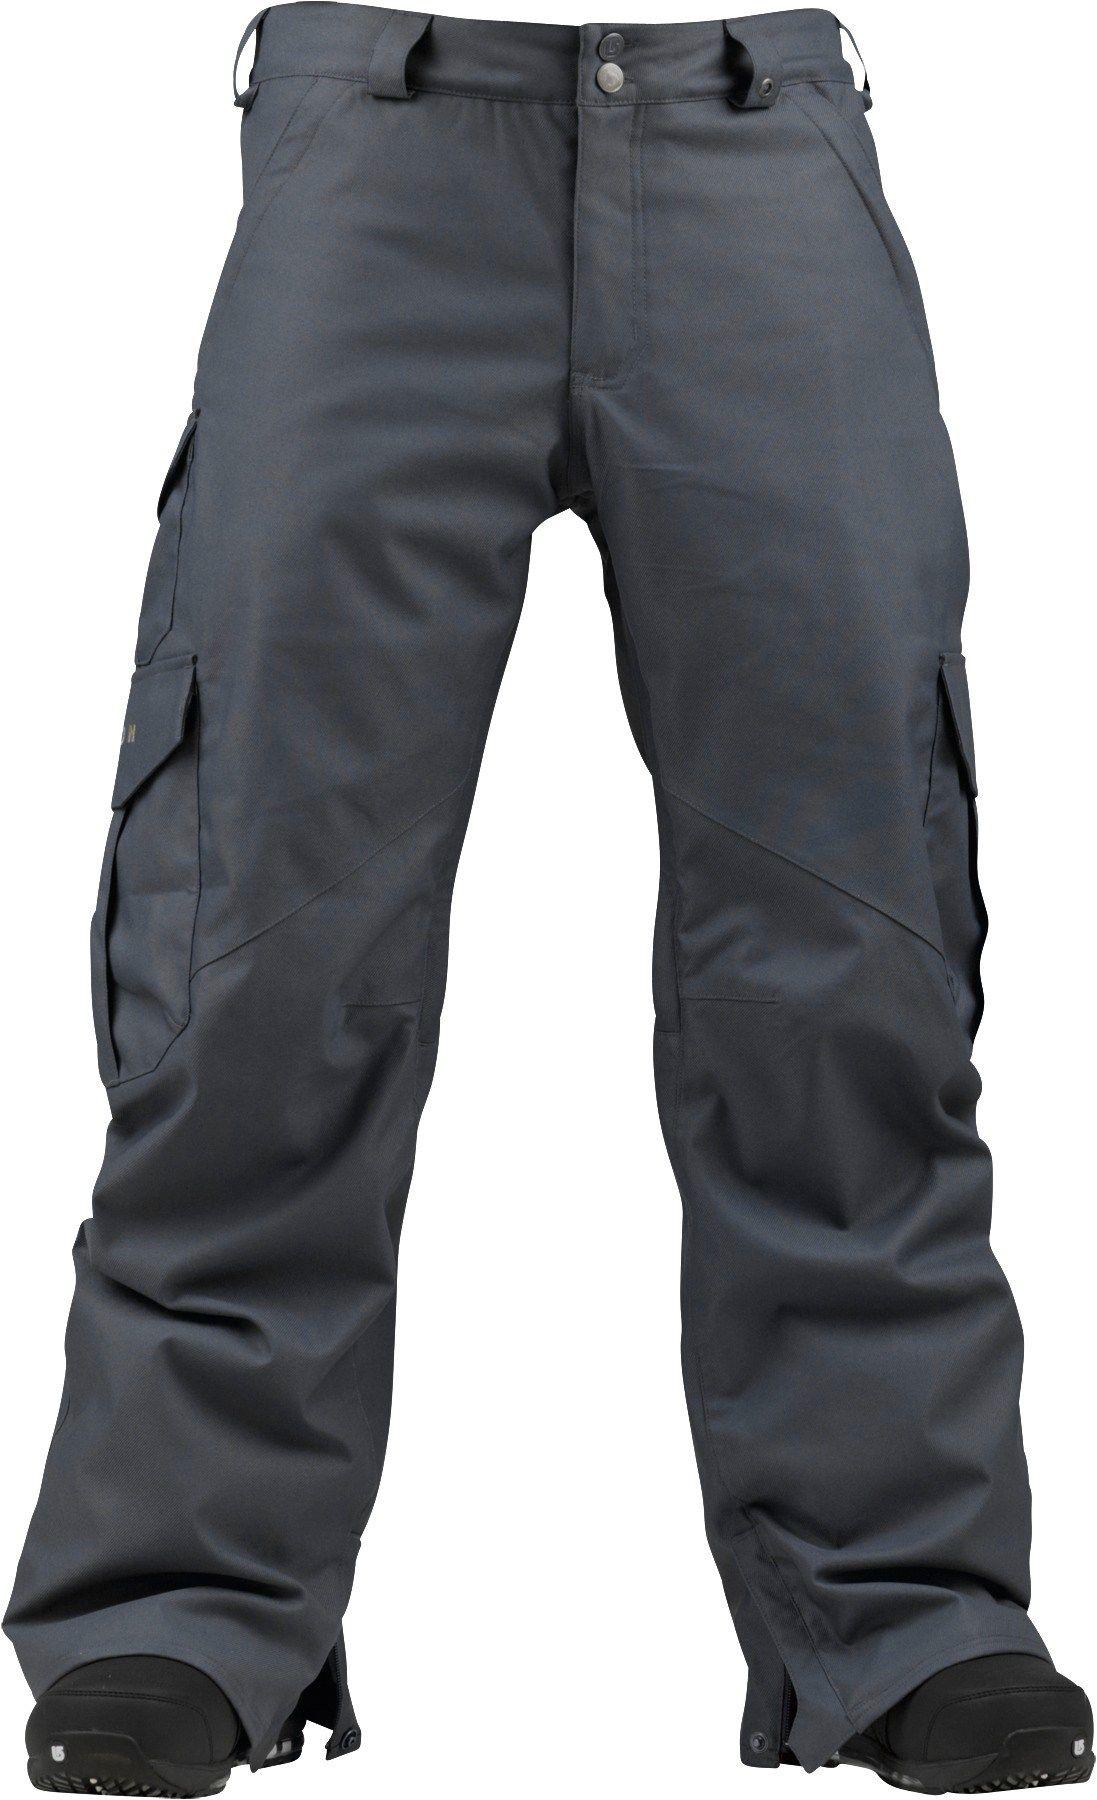 0e608d6429 Burton Cargo Shell Pants - Men s - Free Shipping at REI.com Ski Gear